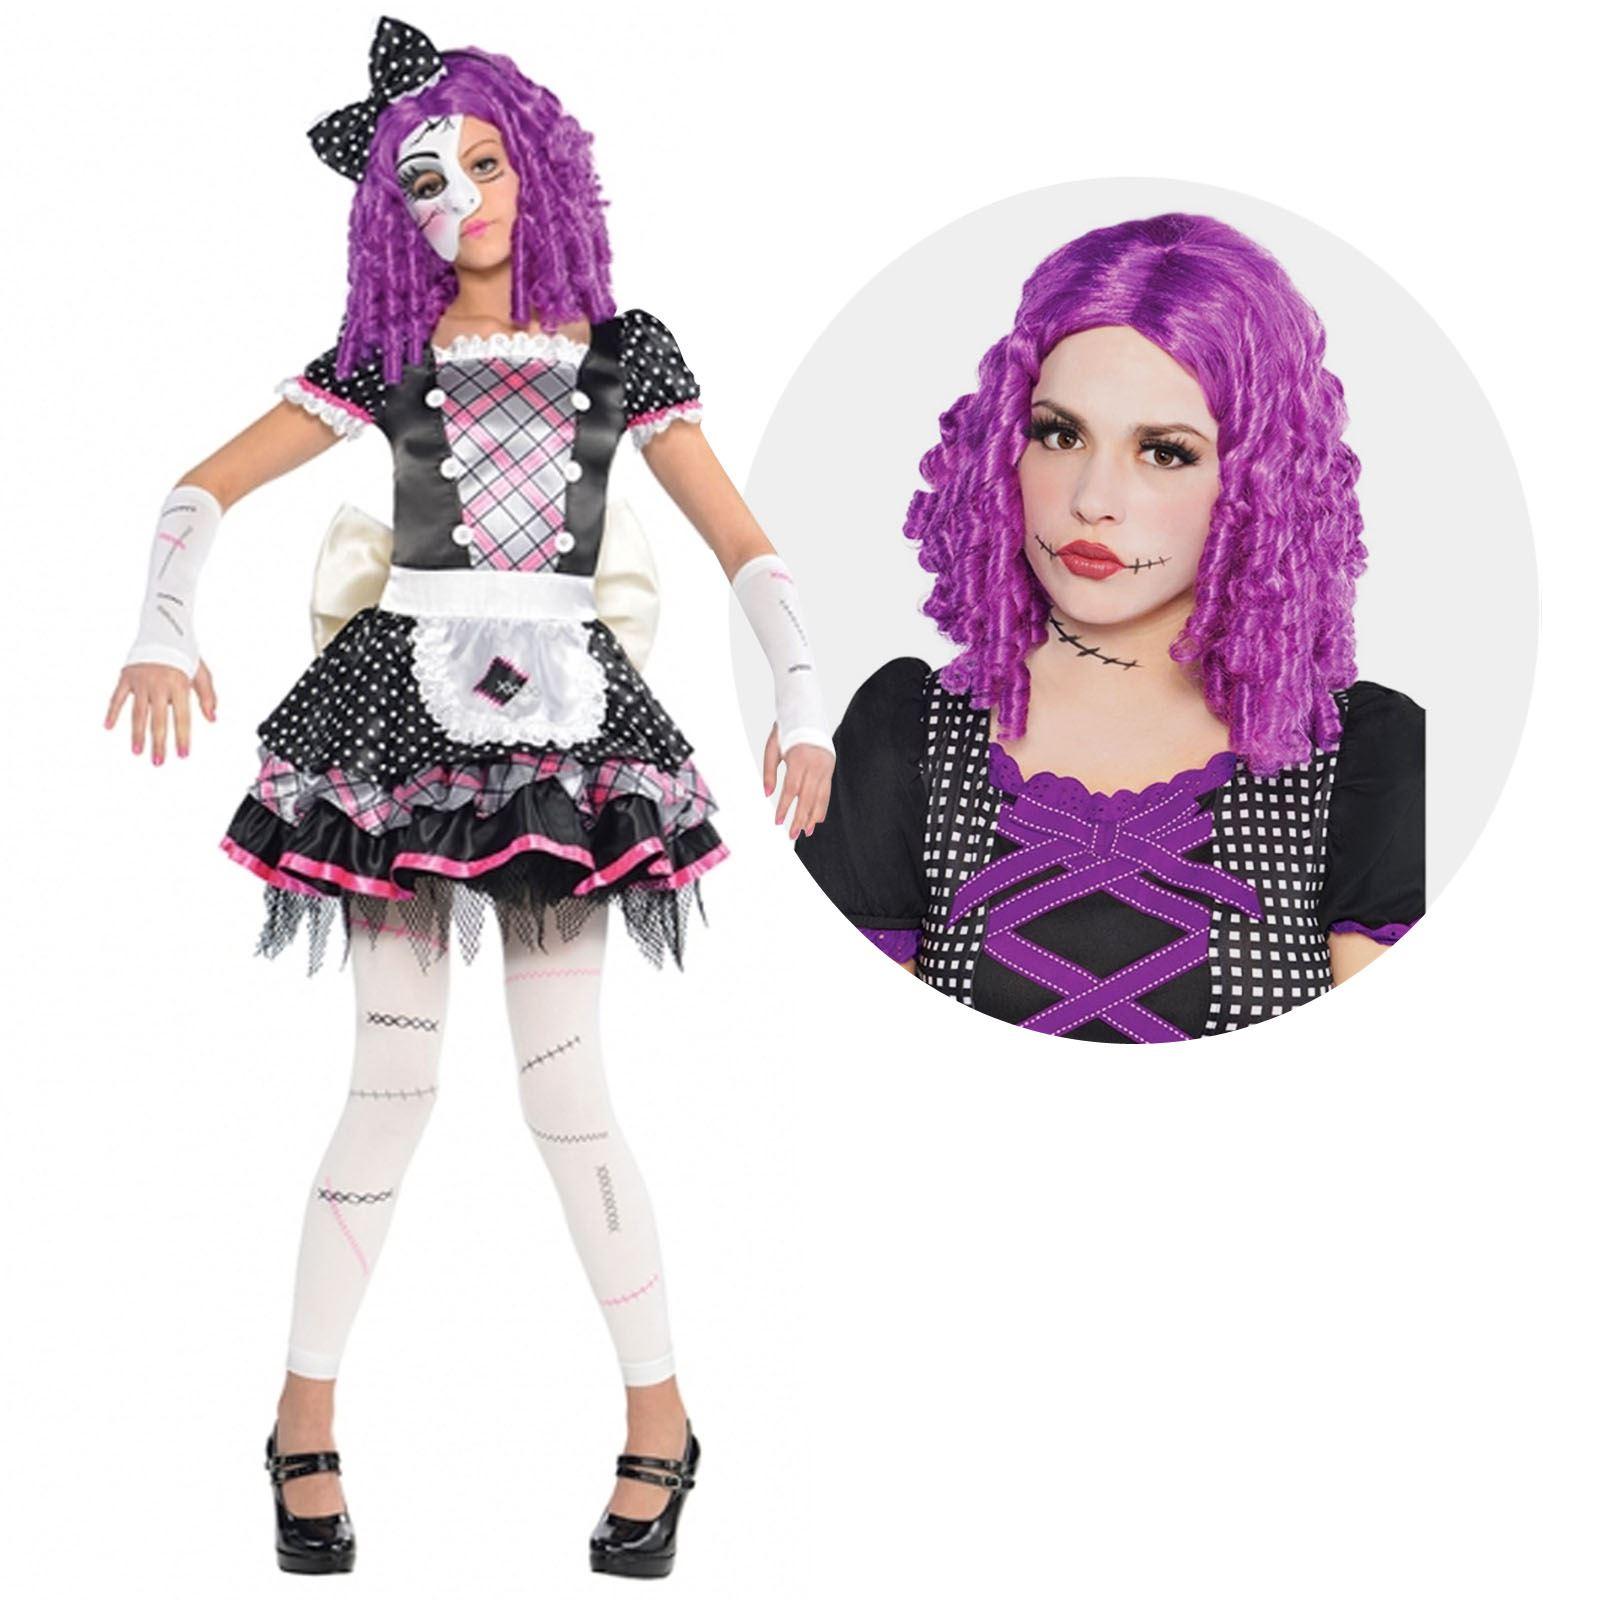 girl damaged doll sally nightmare monster fancy dress halloween